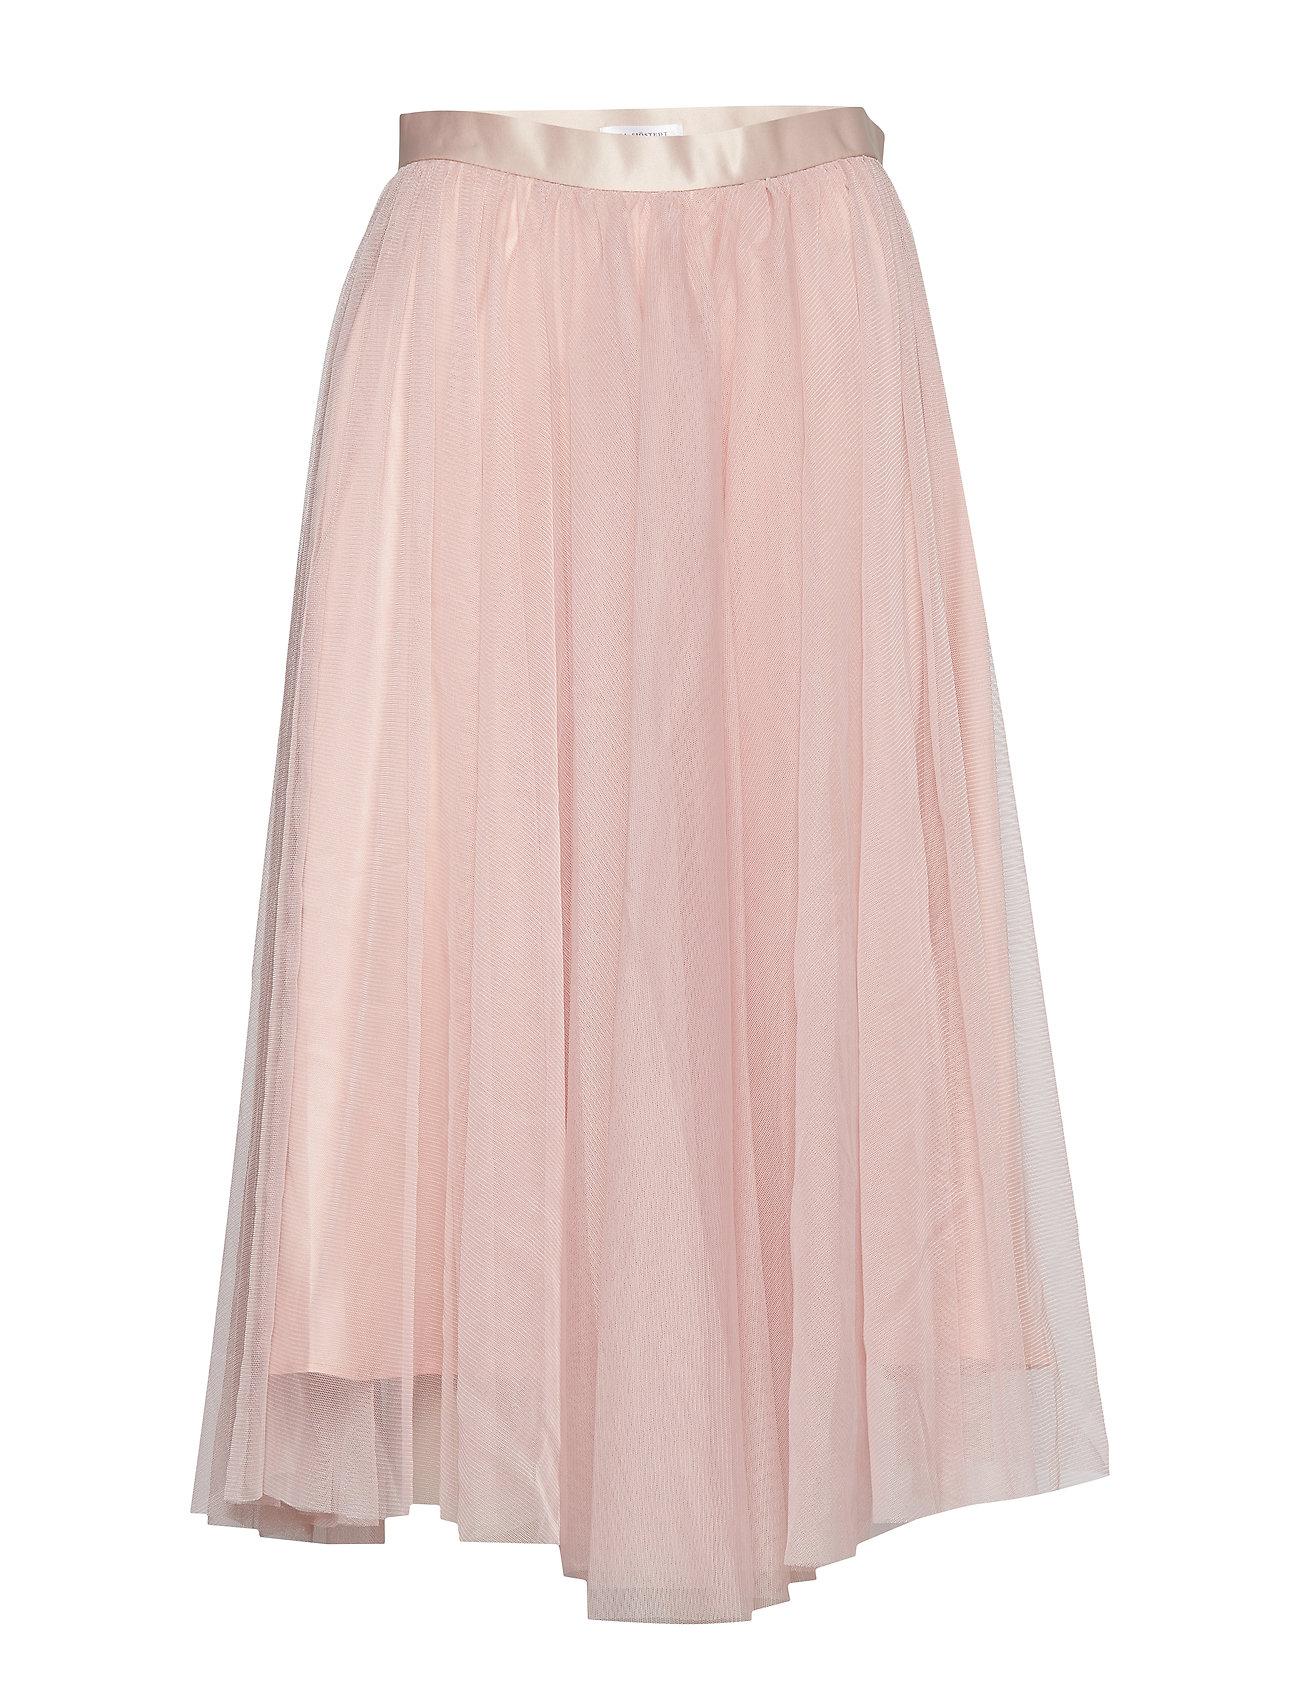 Ida Sjöstedt Flawless Skirt - DUSKY PINK